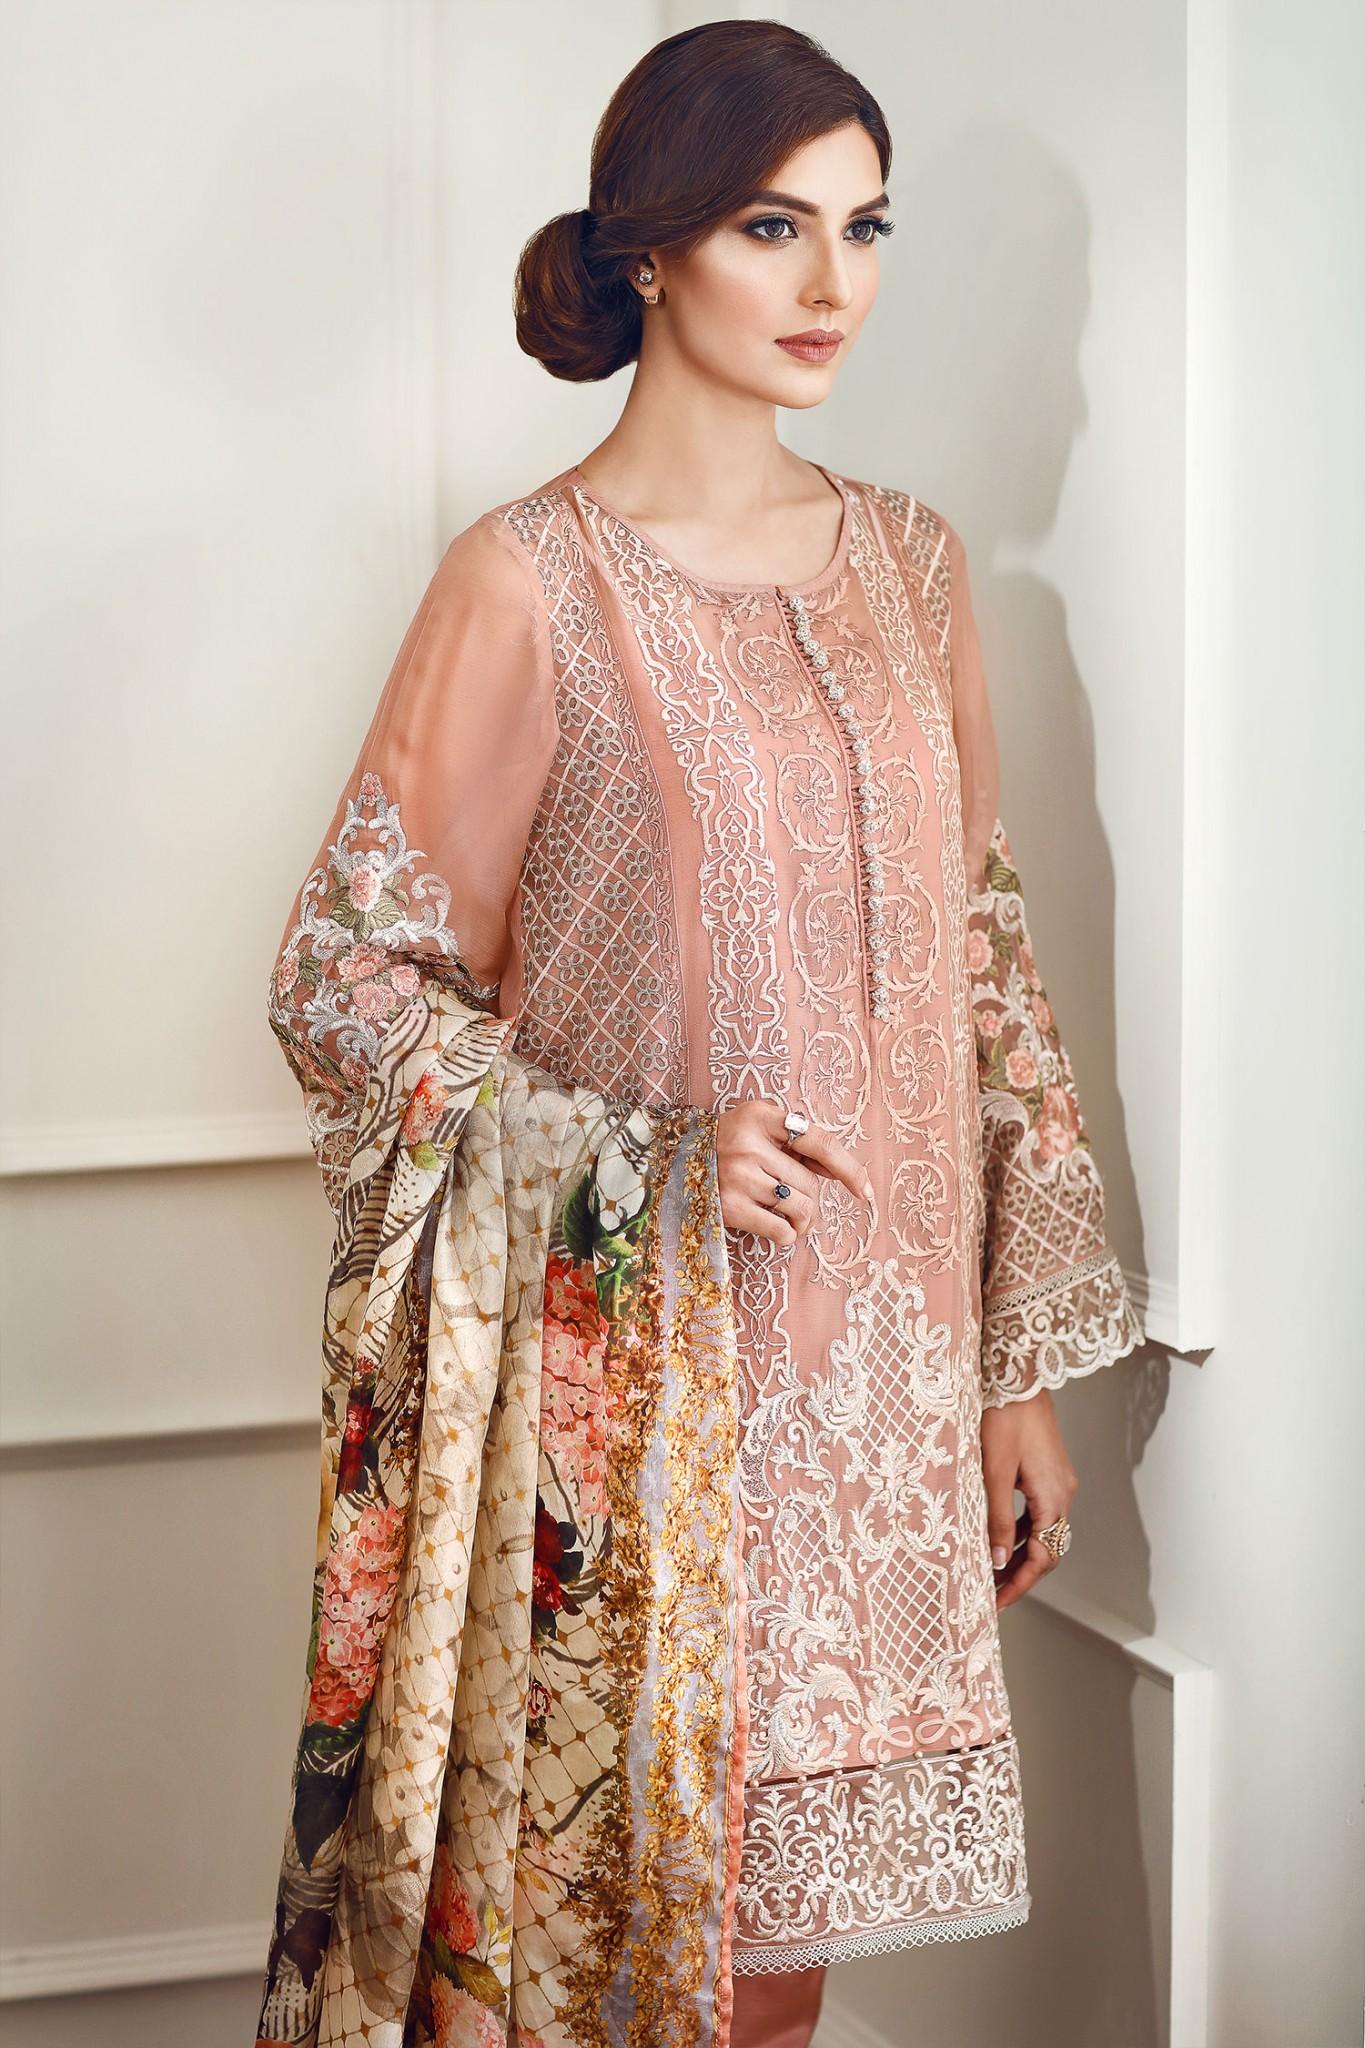 Latest Eid Dresses 2017 For Girls In Pakistan - StyleGlow.com